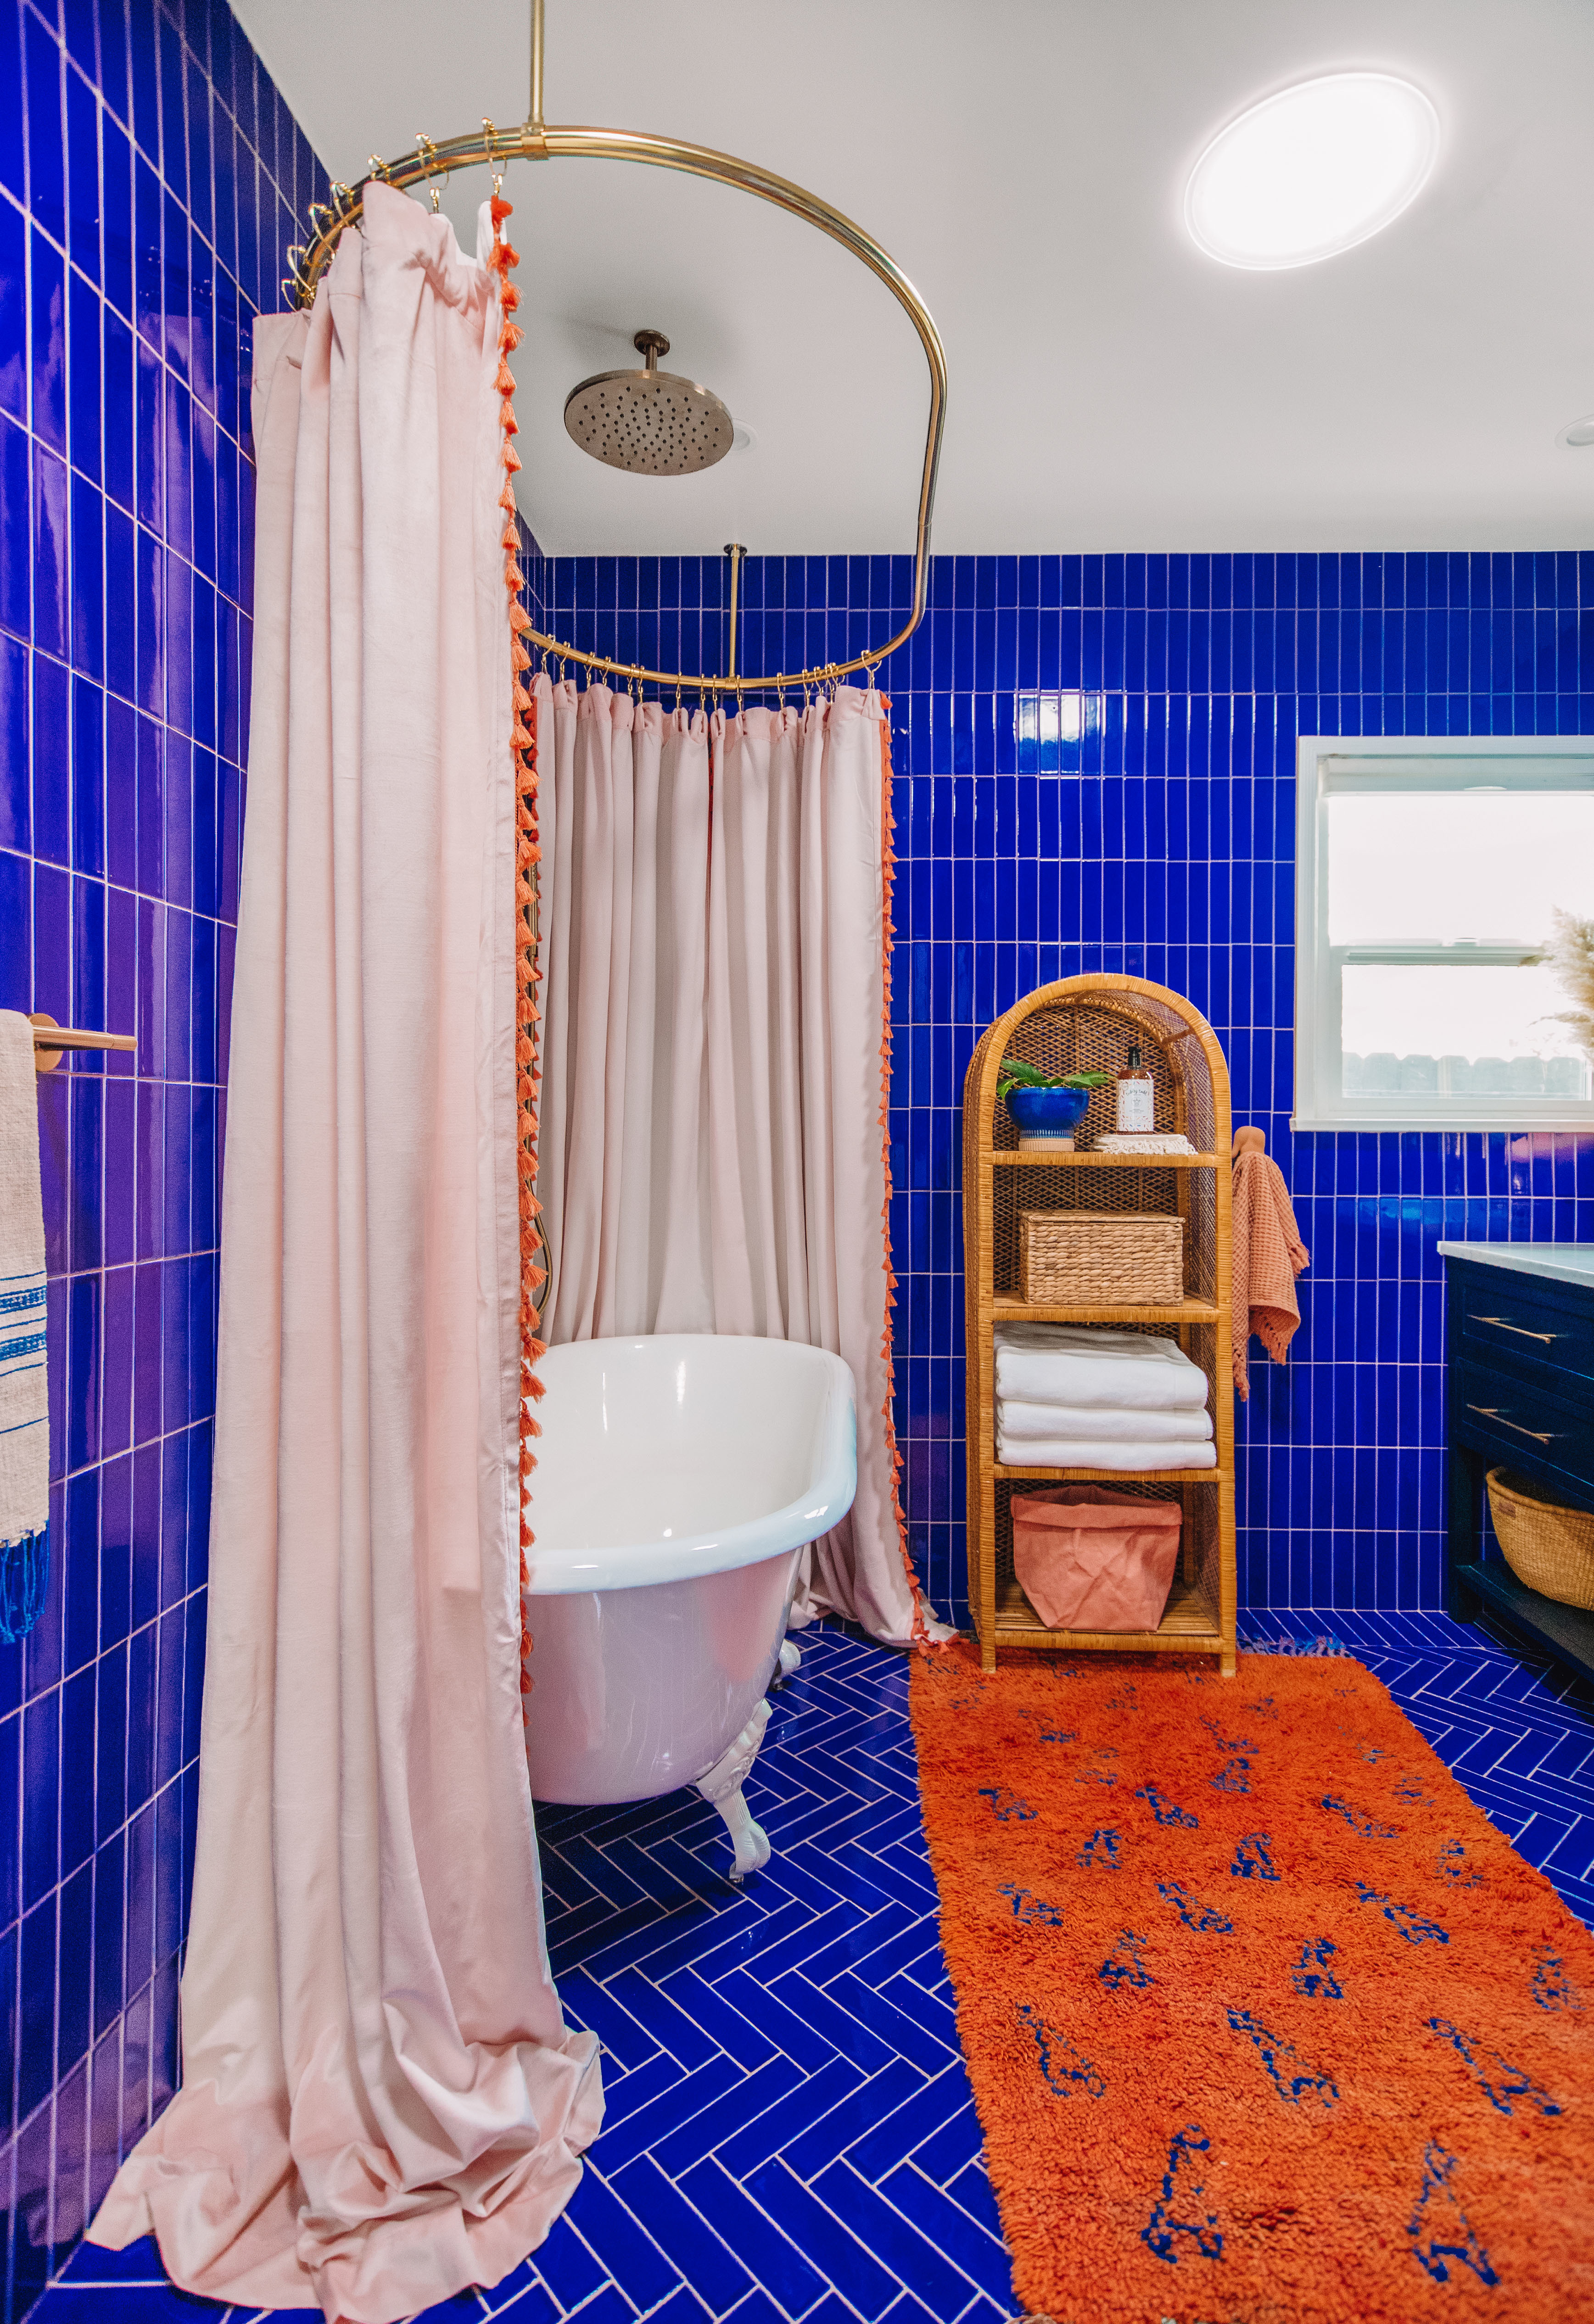 Blue-and-Terracotta-Guest-Bathroom-Makeoverfeat3.jpg#asset:4440